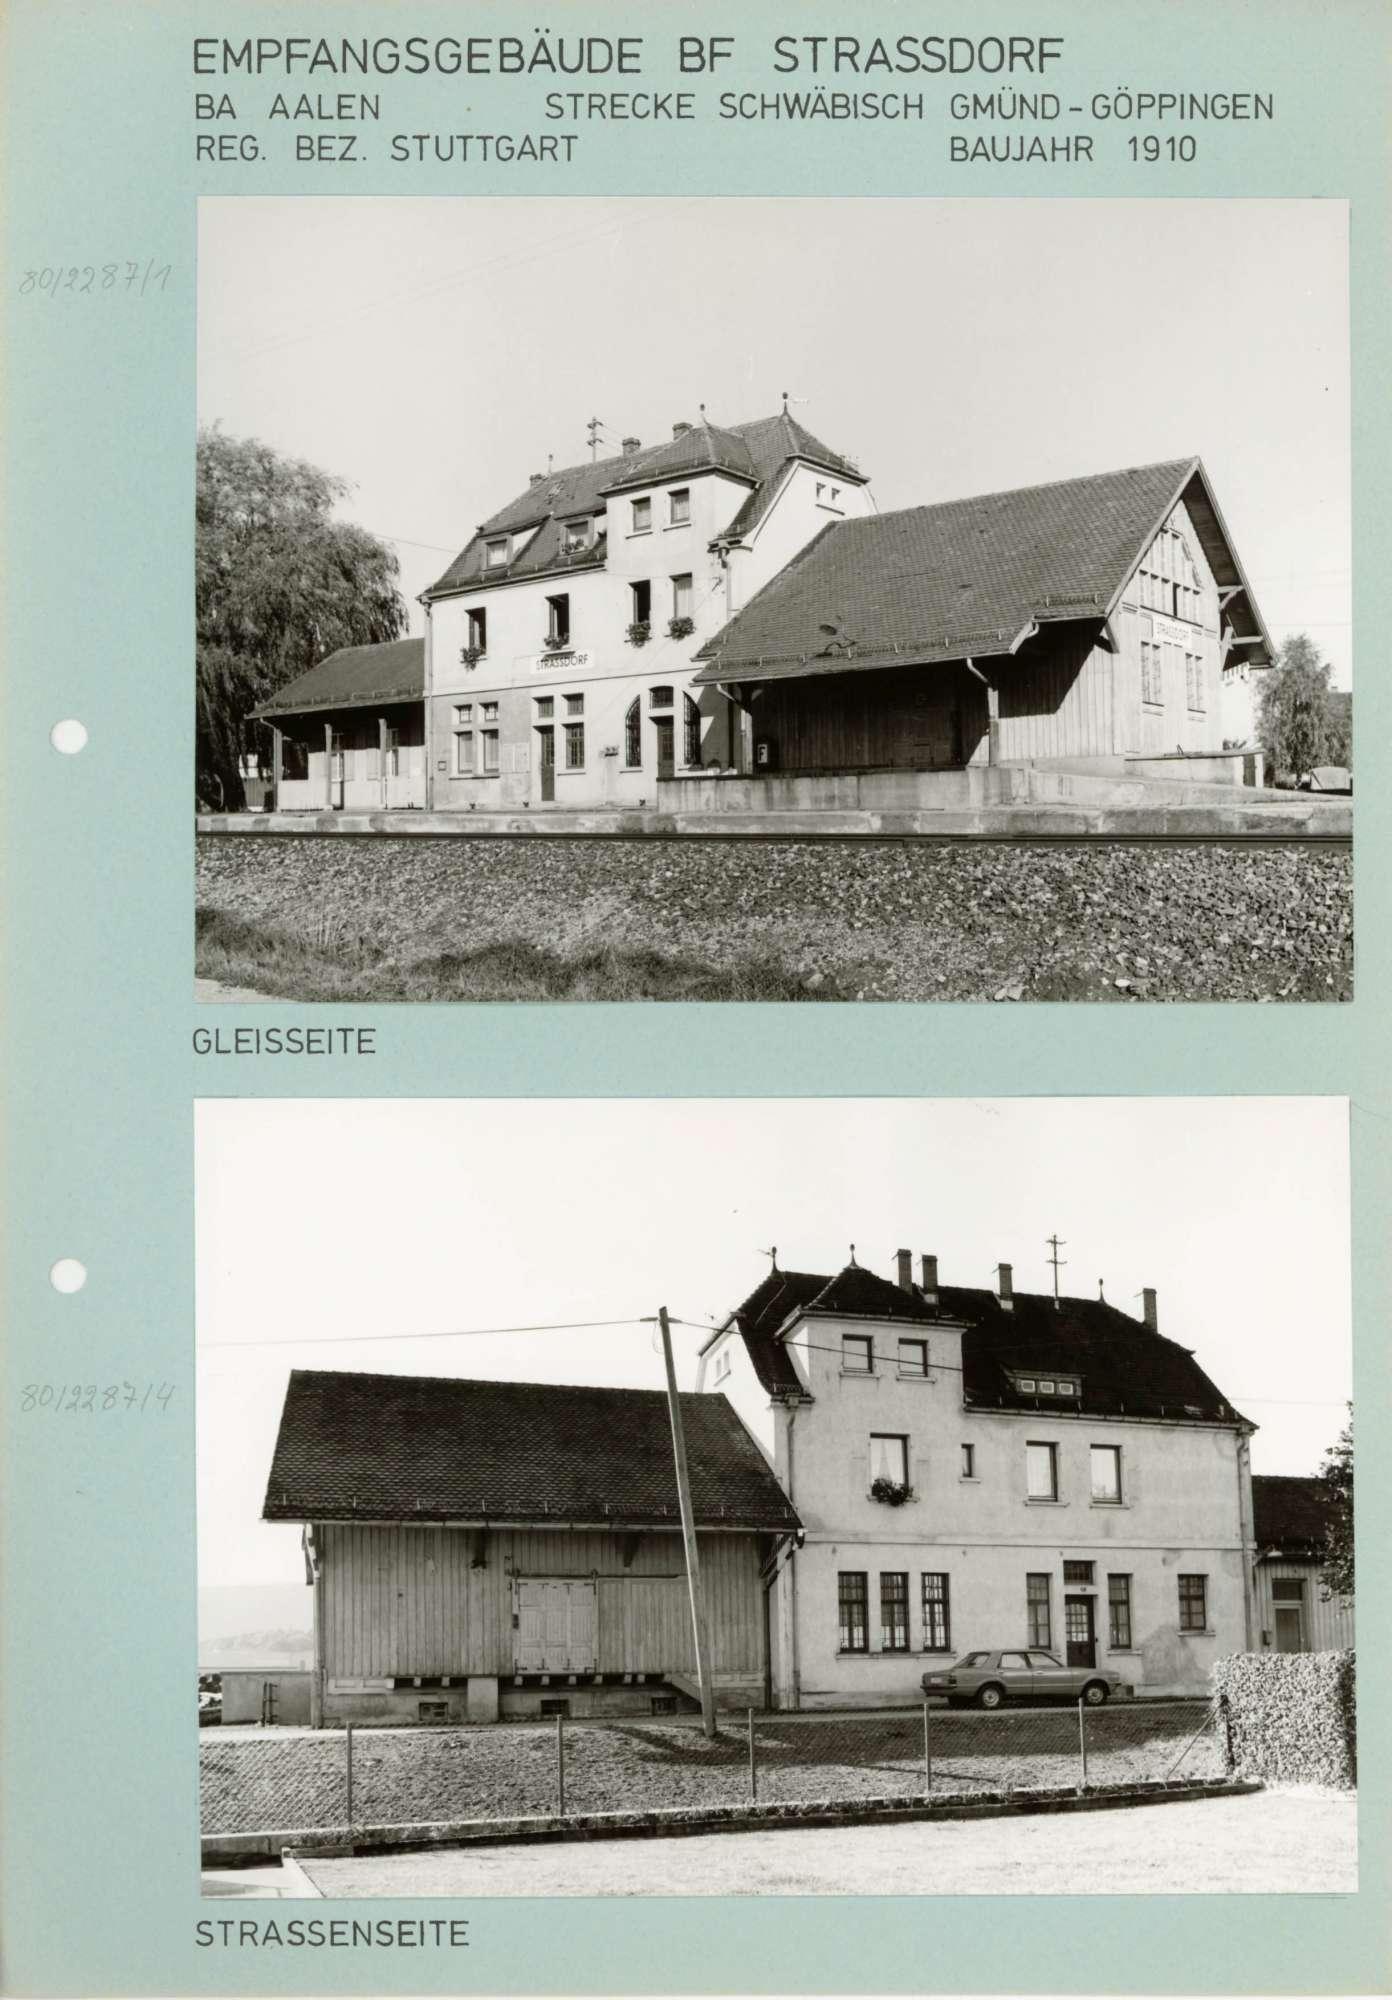 Straßdorf: 4 Fotos, Bild 1